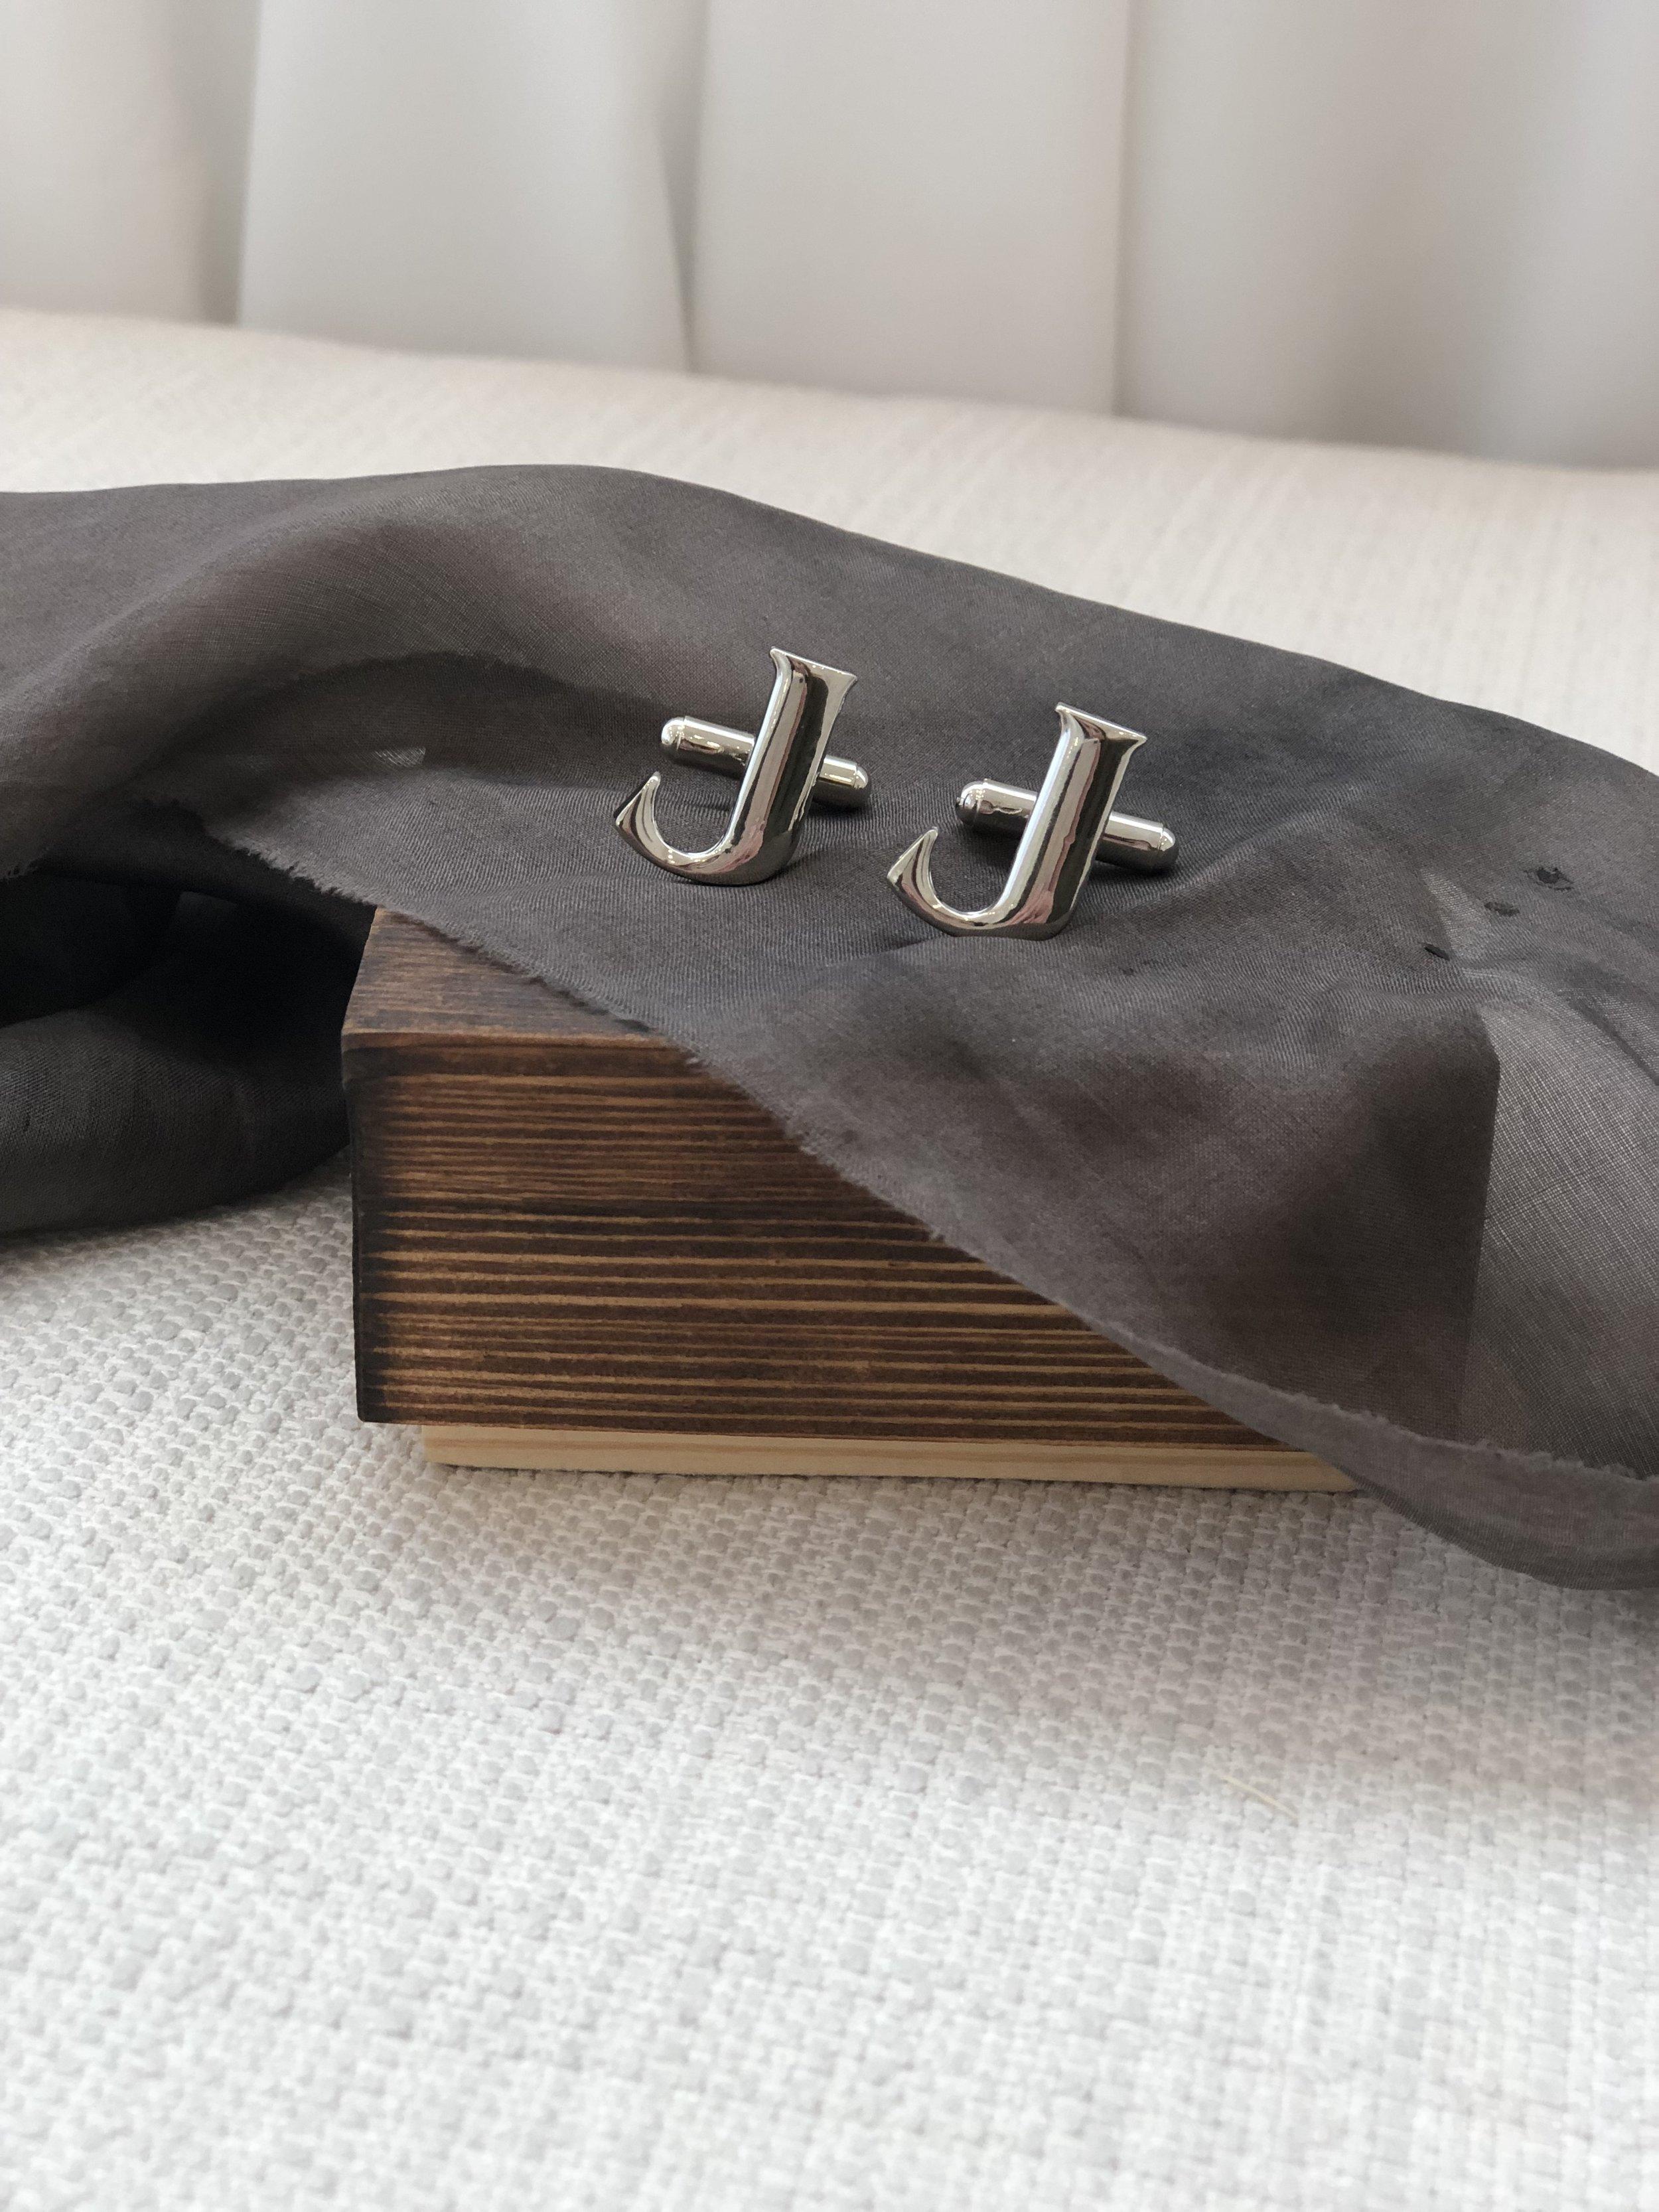 personalized groomsmen gift cuff links